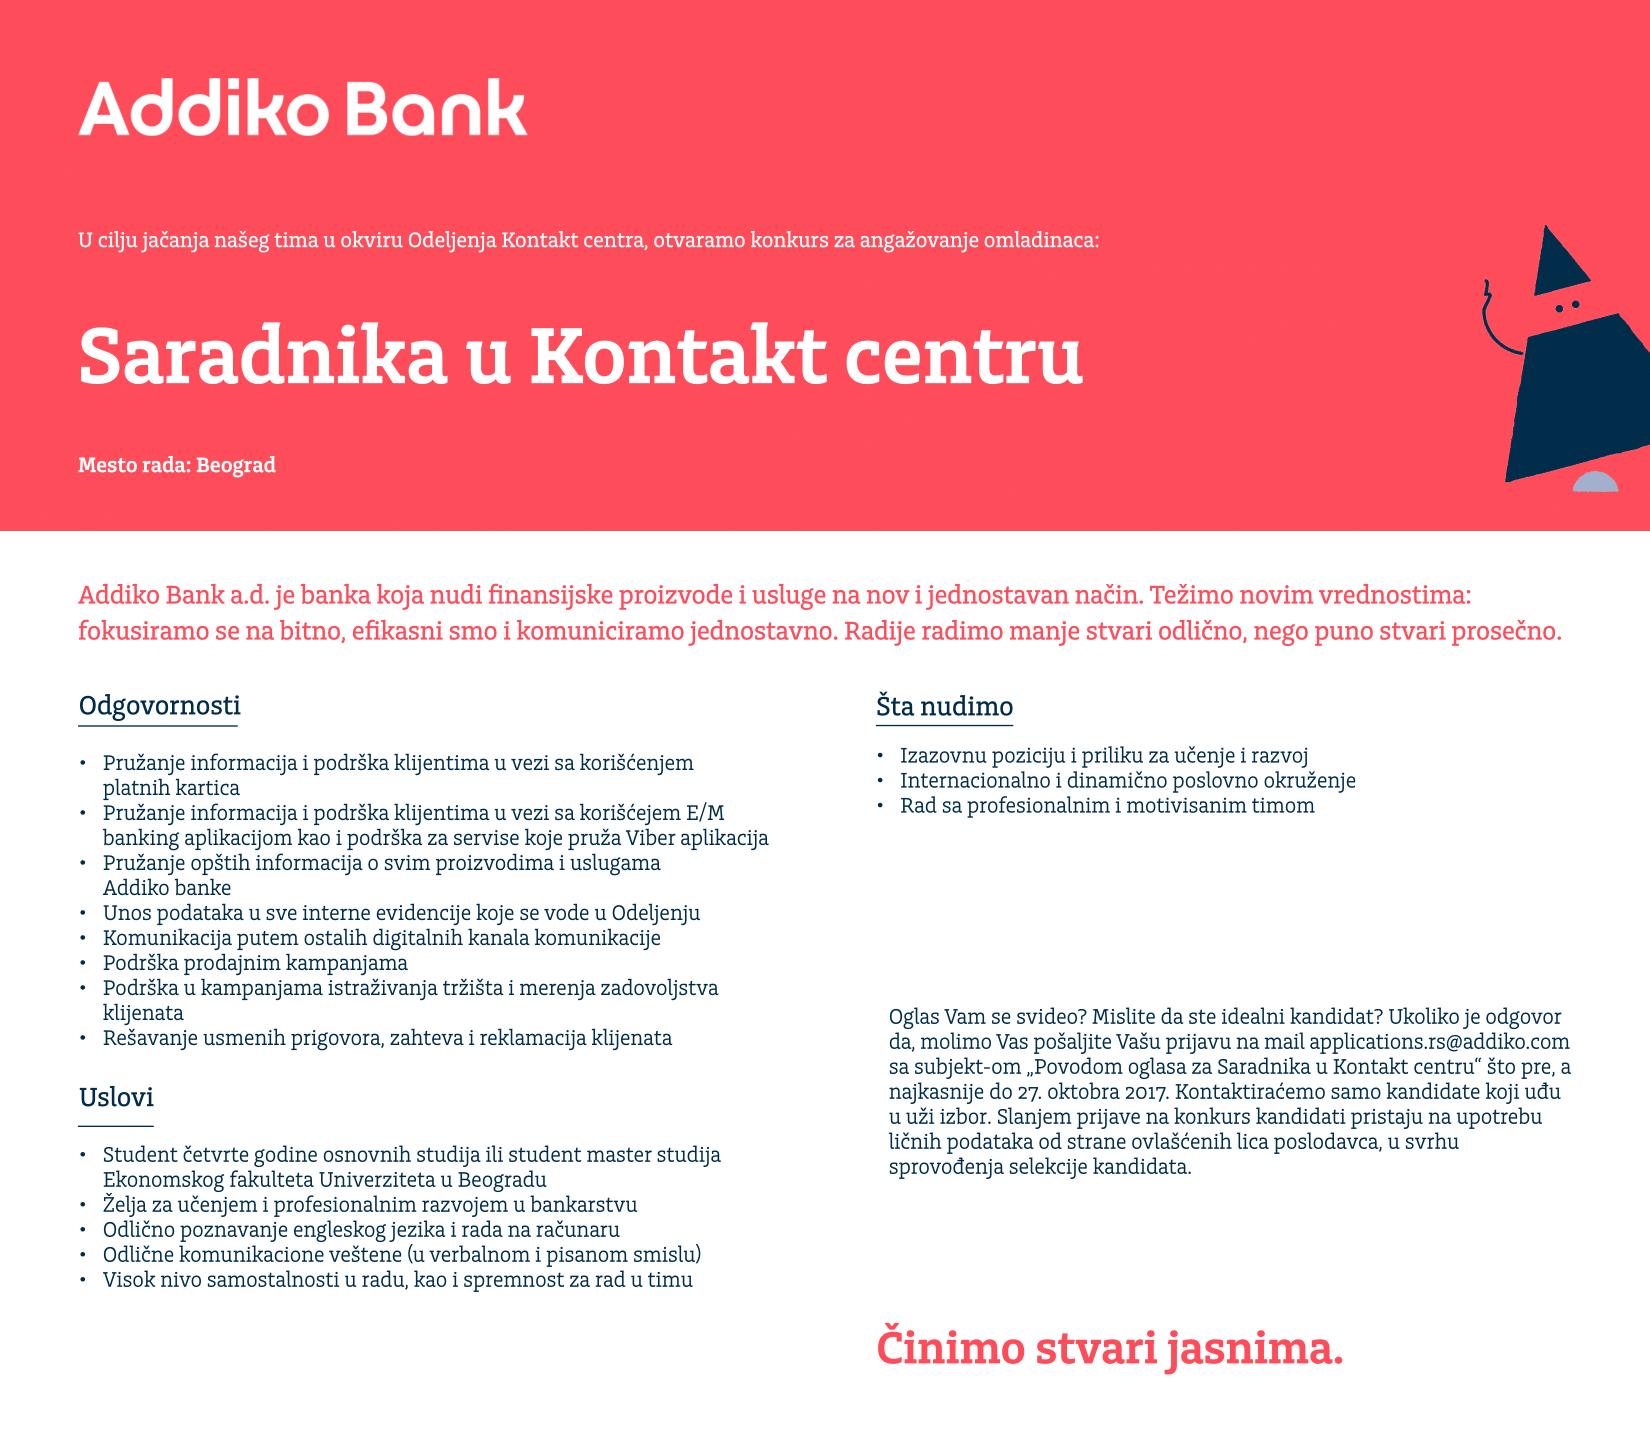 Addiko-201704-12575-Oglas posao-SRB-Saradnik-1